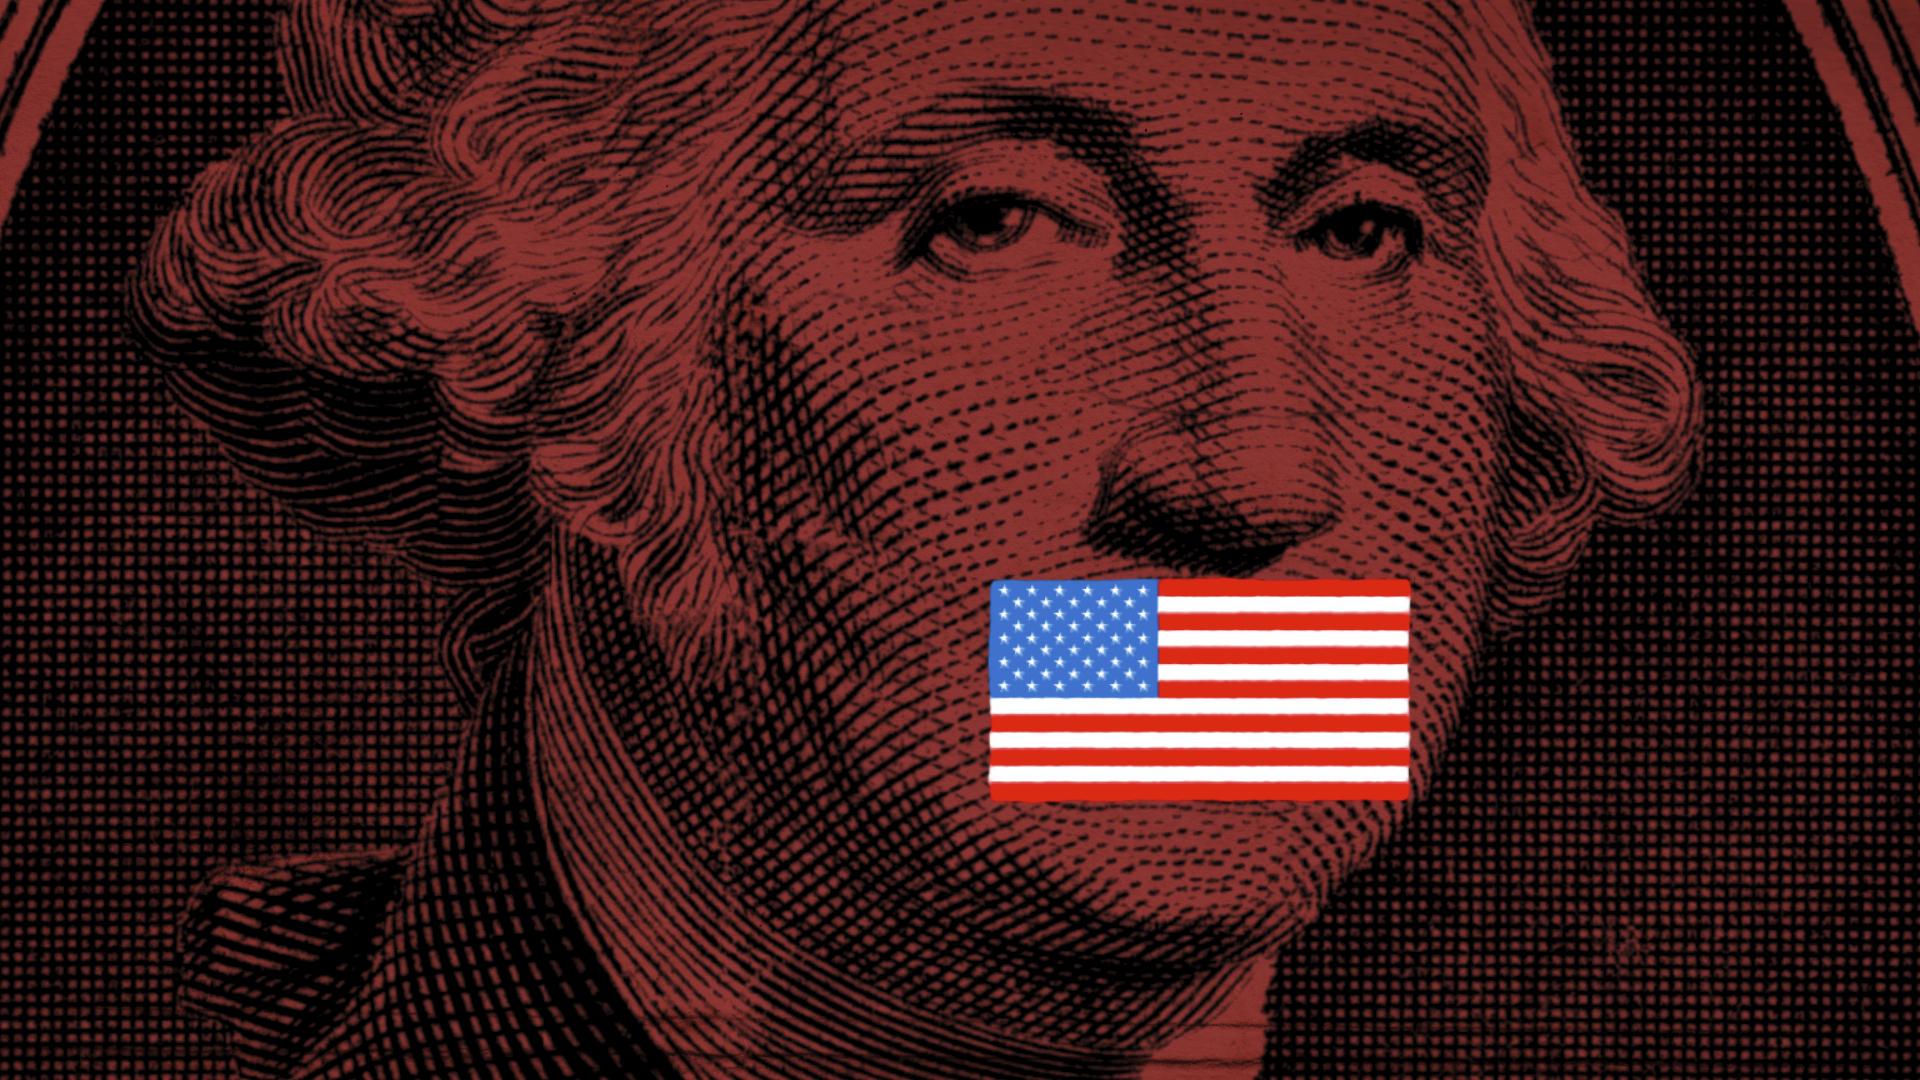 Washington, Governent Corruption